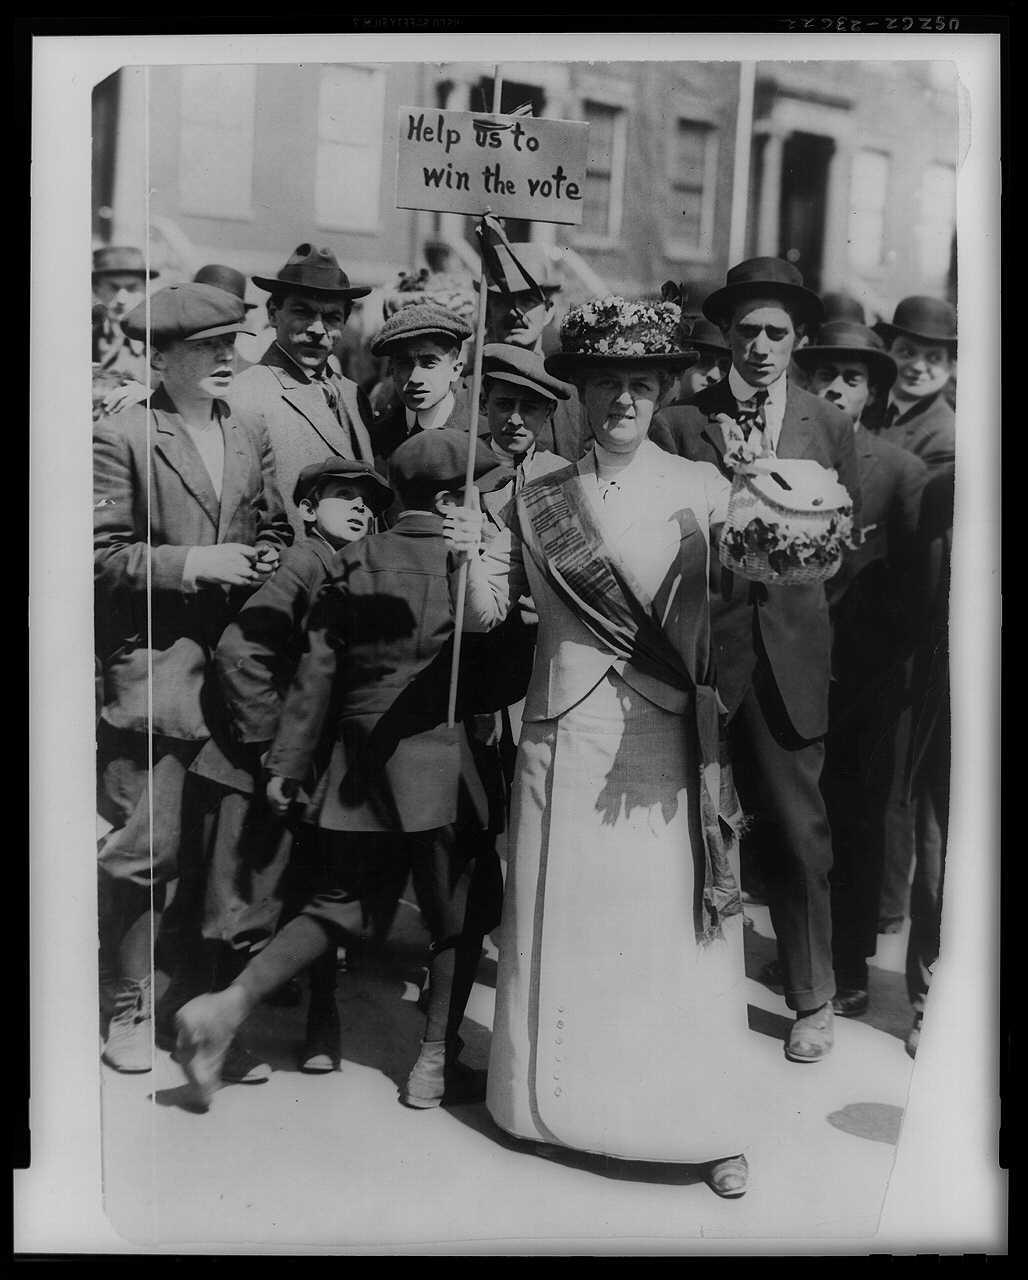 http://mashable.com/2015/01/10/womens-suffrage-19th-amendment/